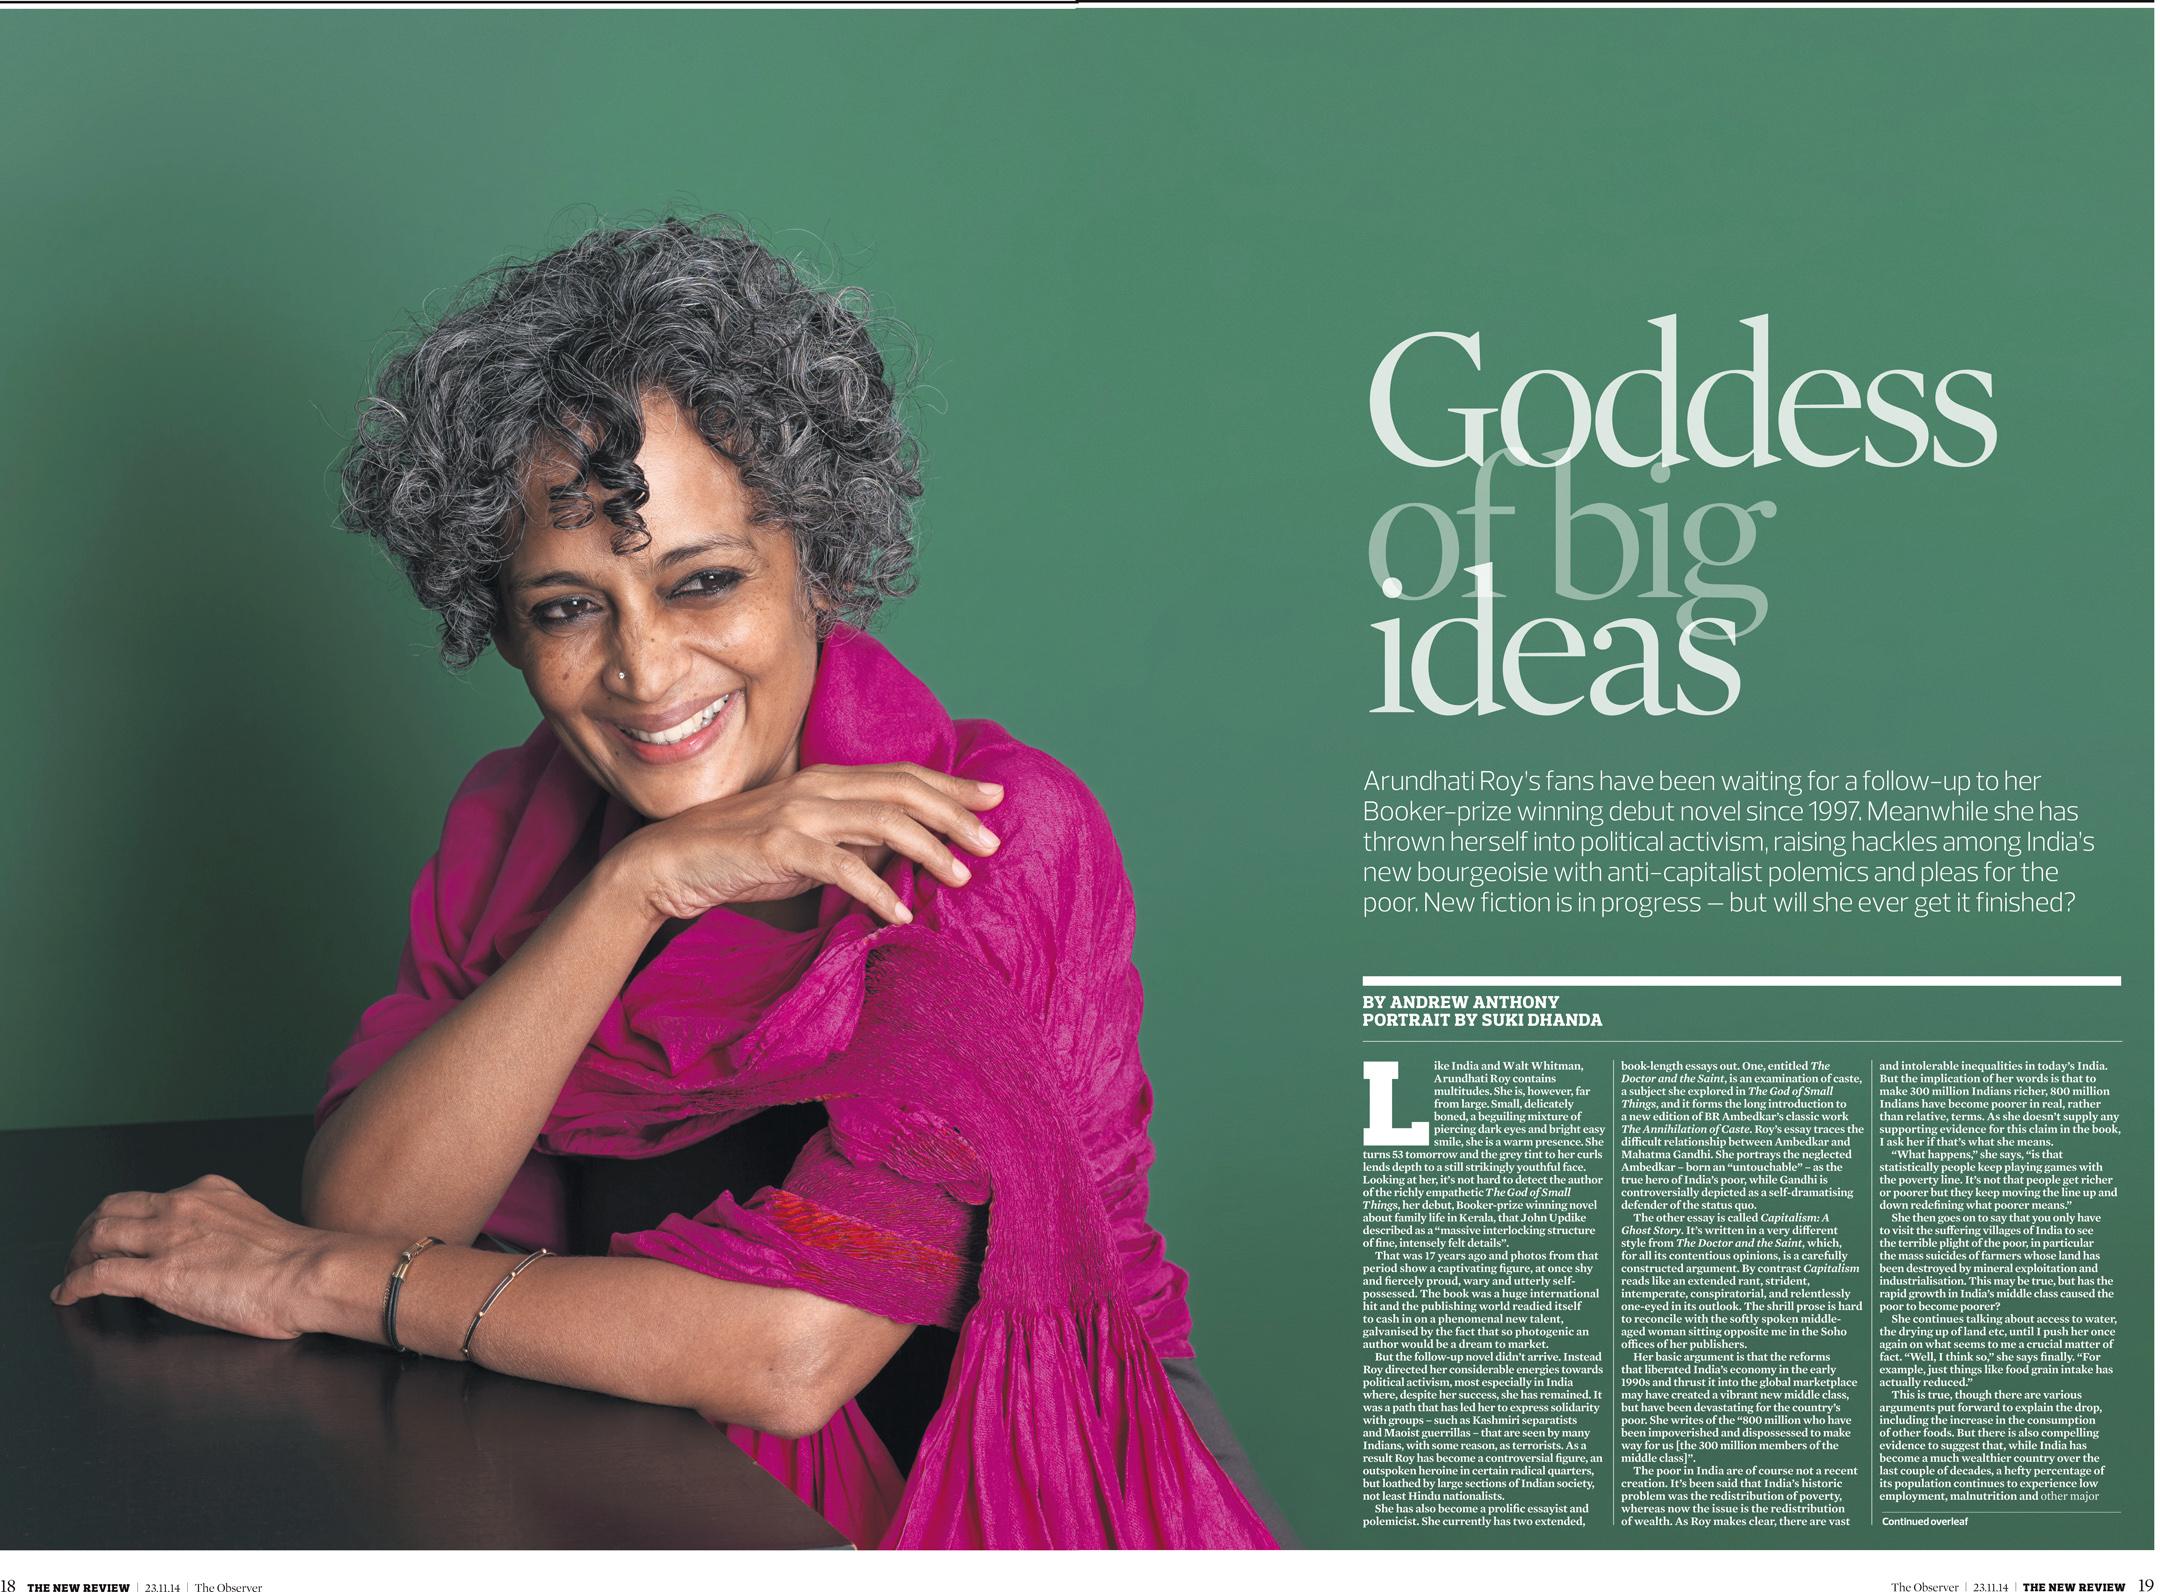 008 Roy Essays By Arundhati Essay Sensational Full